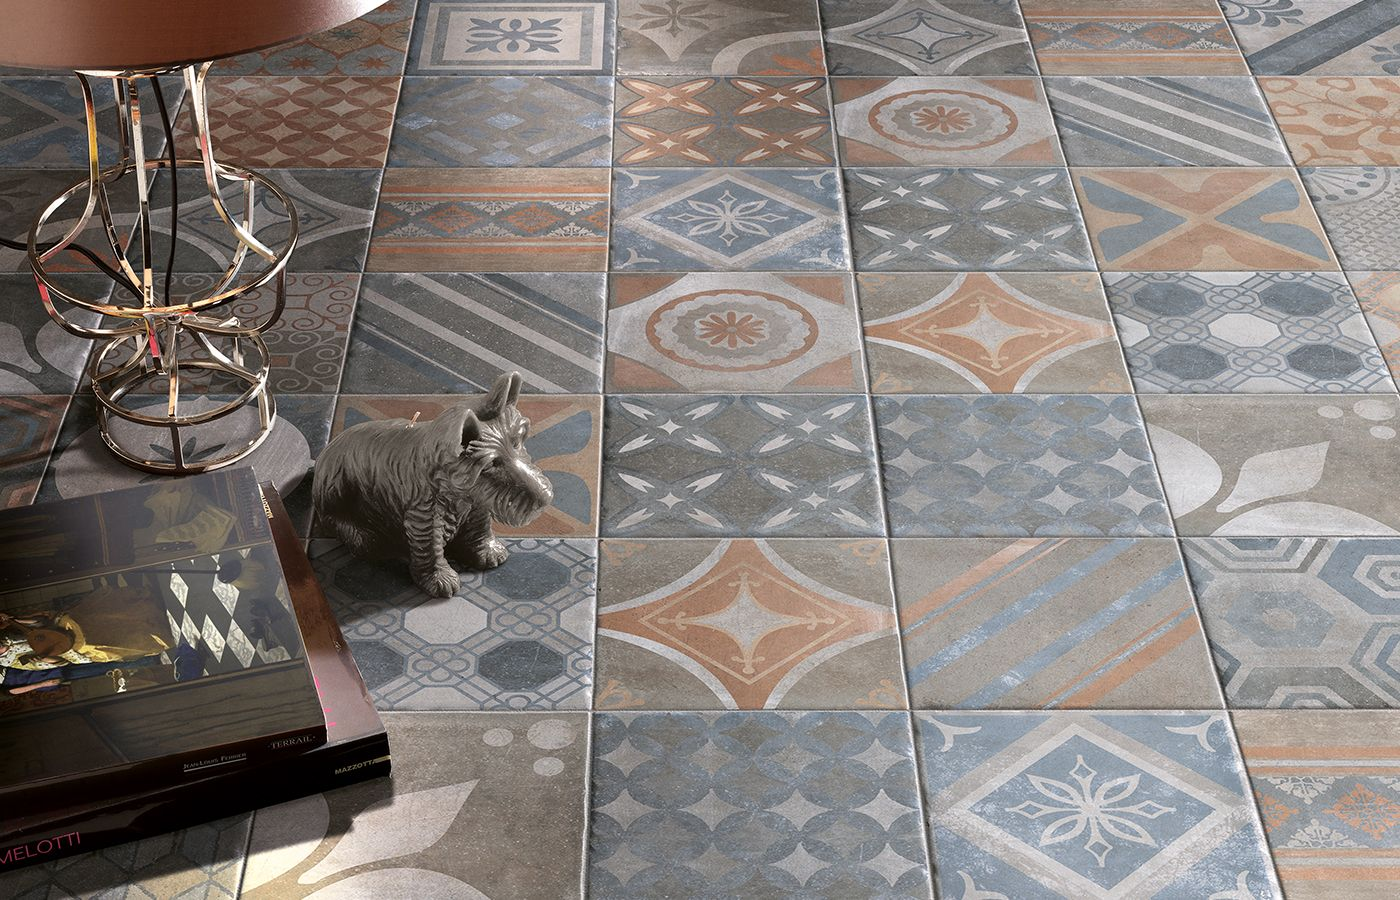 Classic cir manifatture ceramiche new orleans french quarter royal 20x20